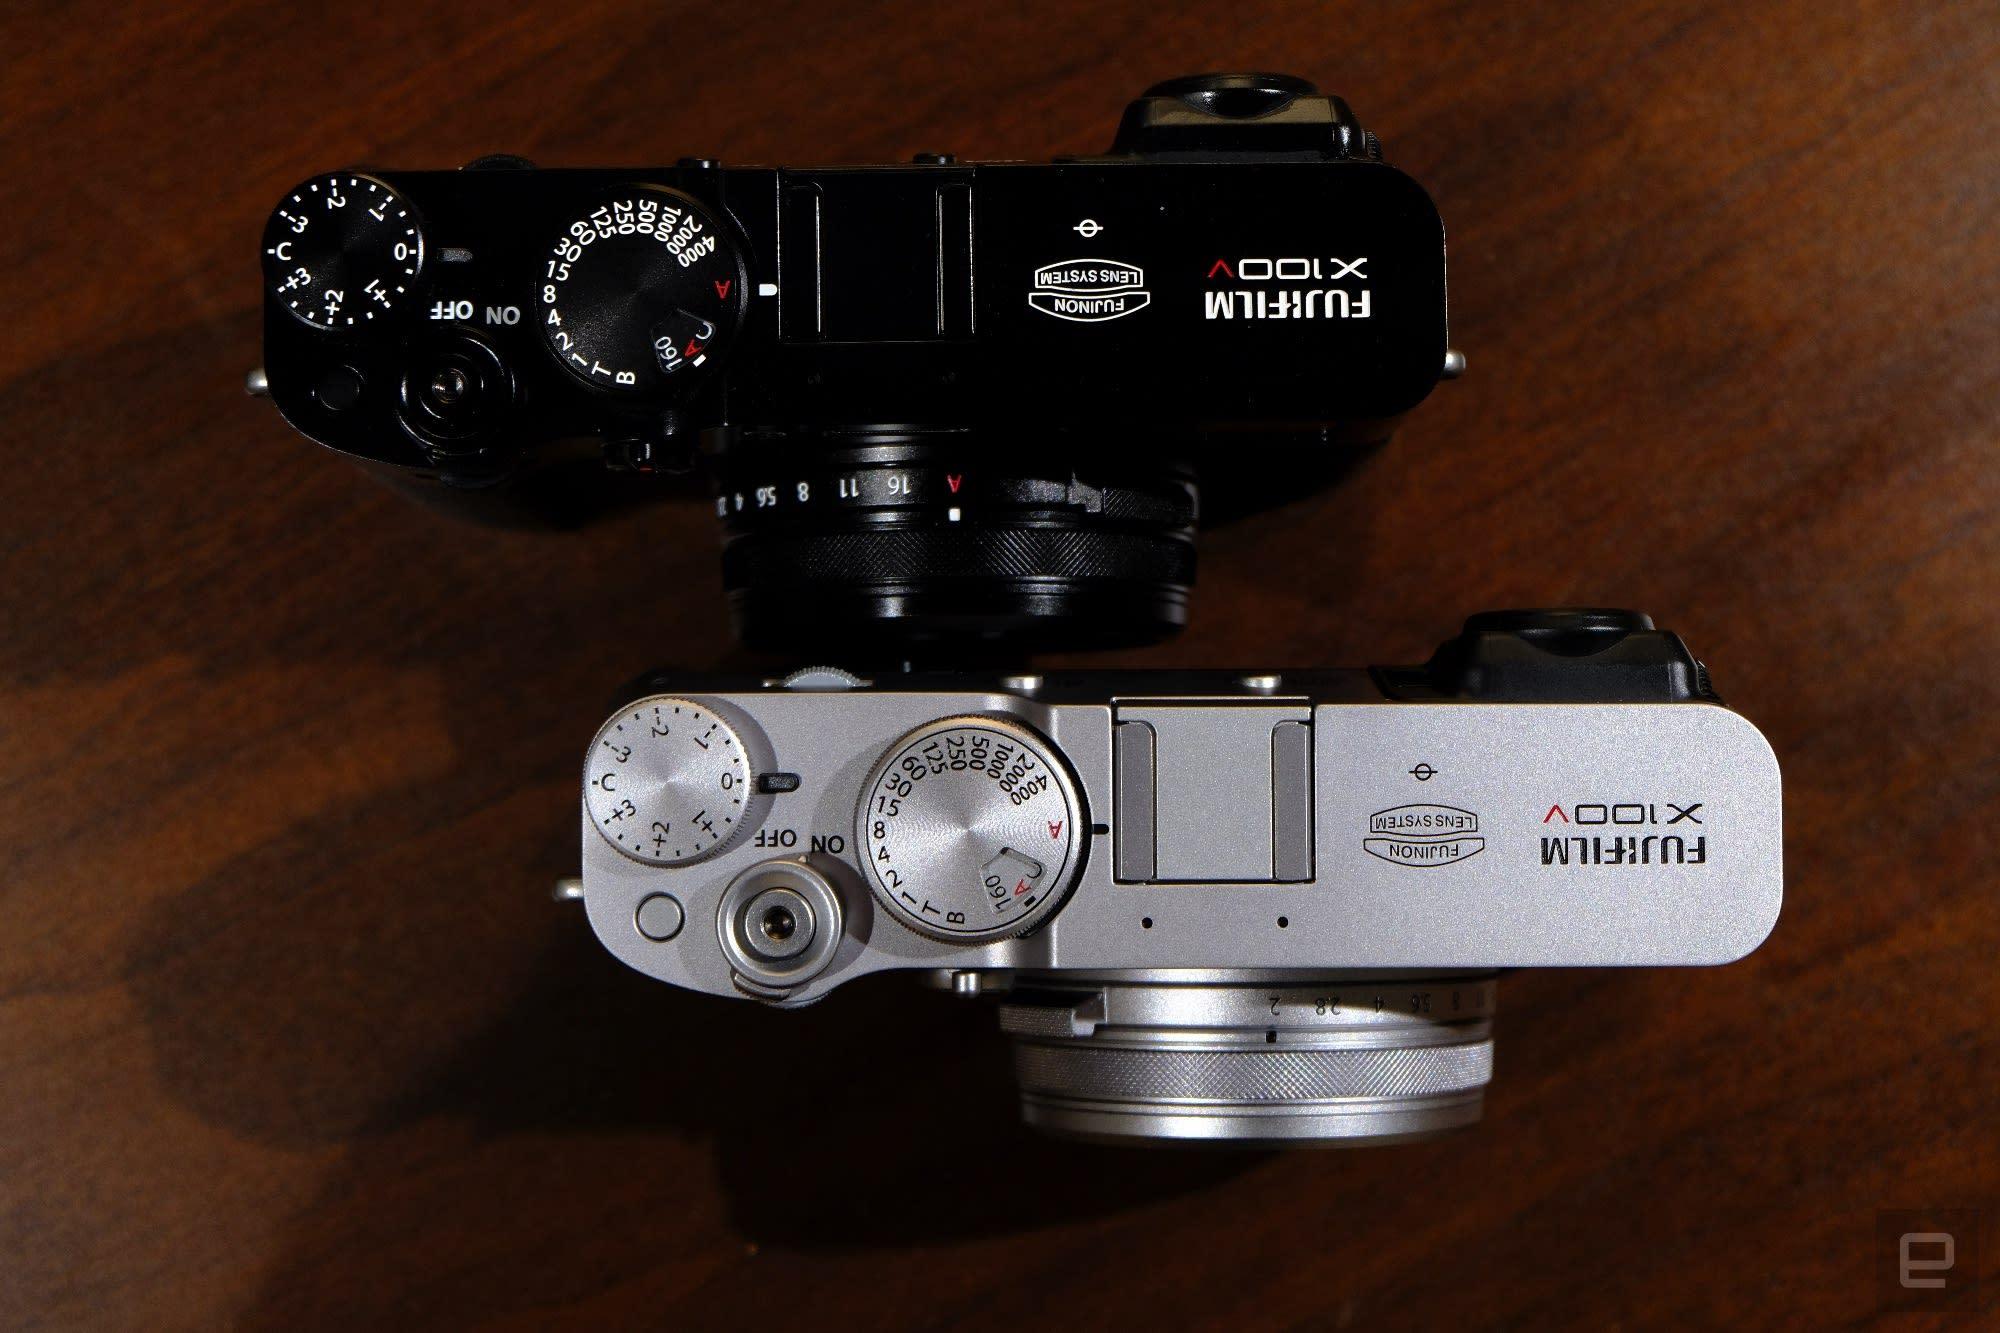 Fujifilm X100V compact street photography camera